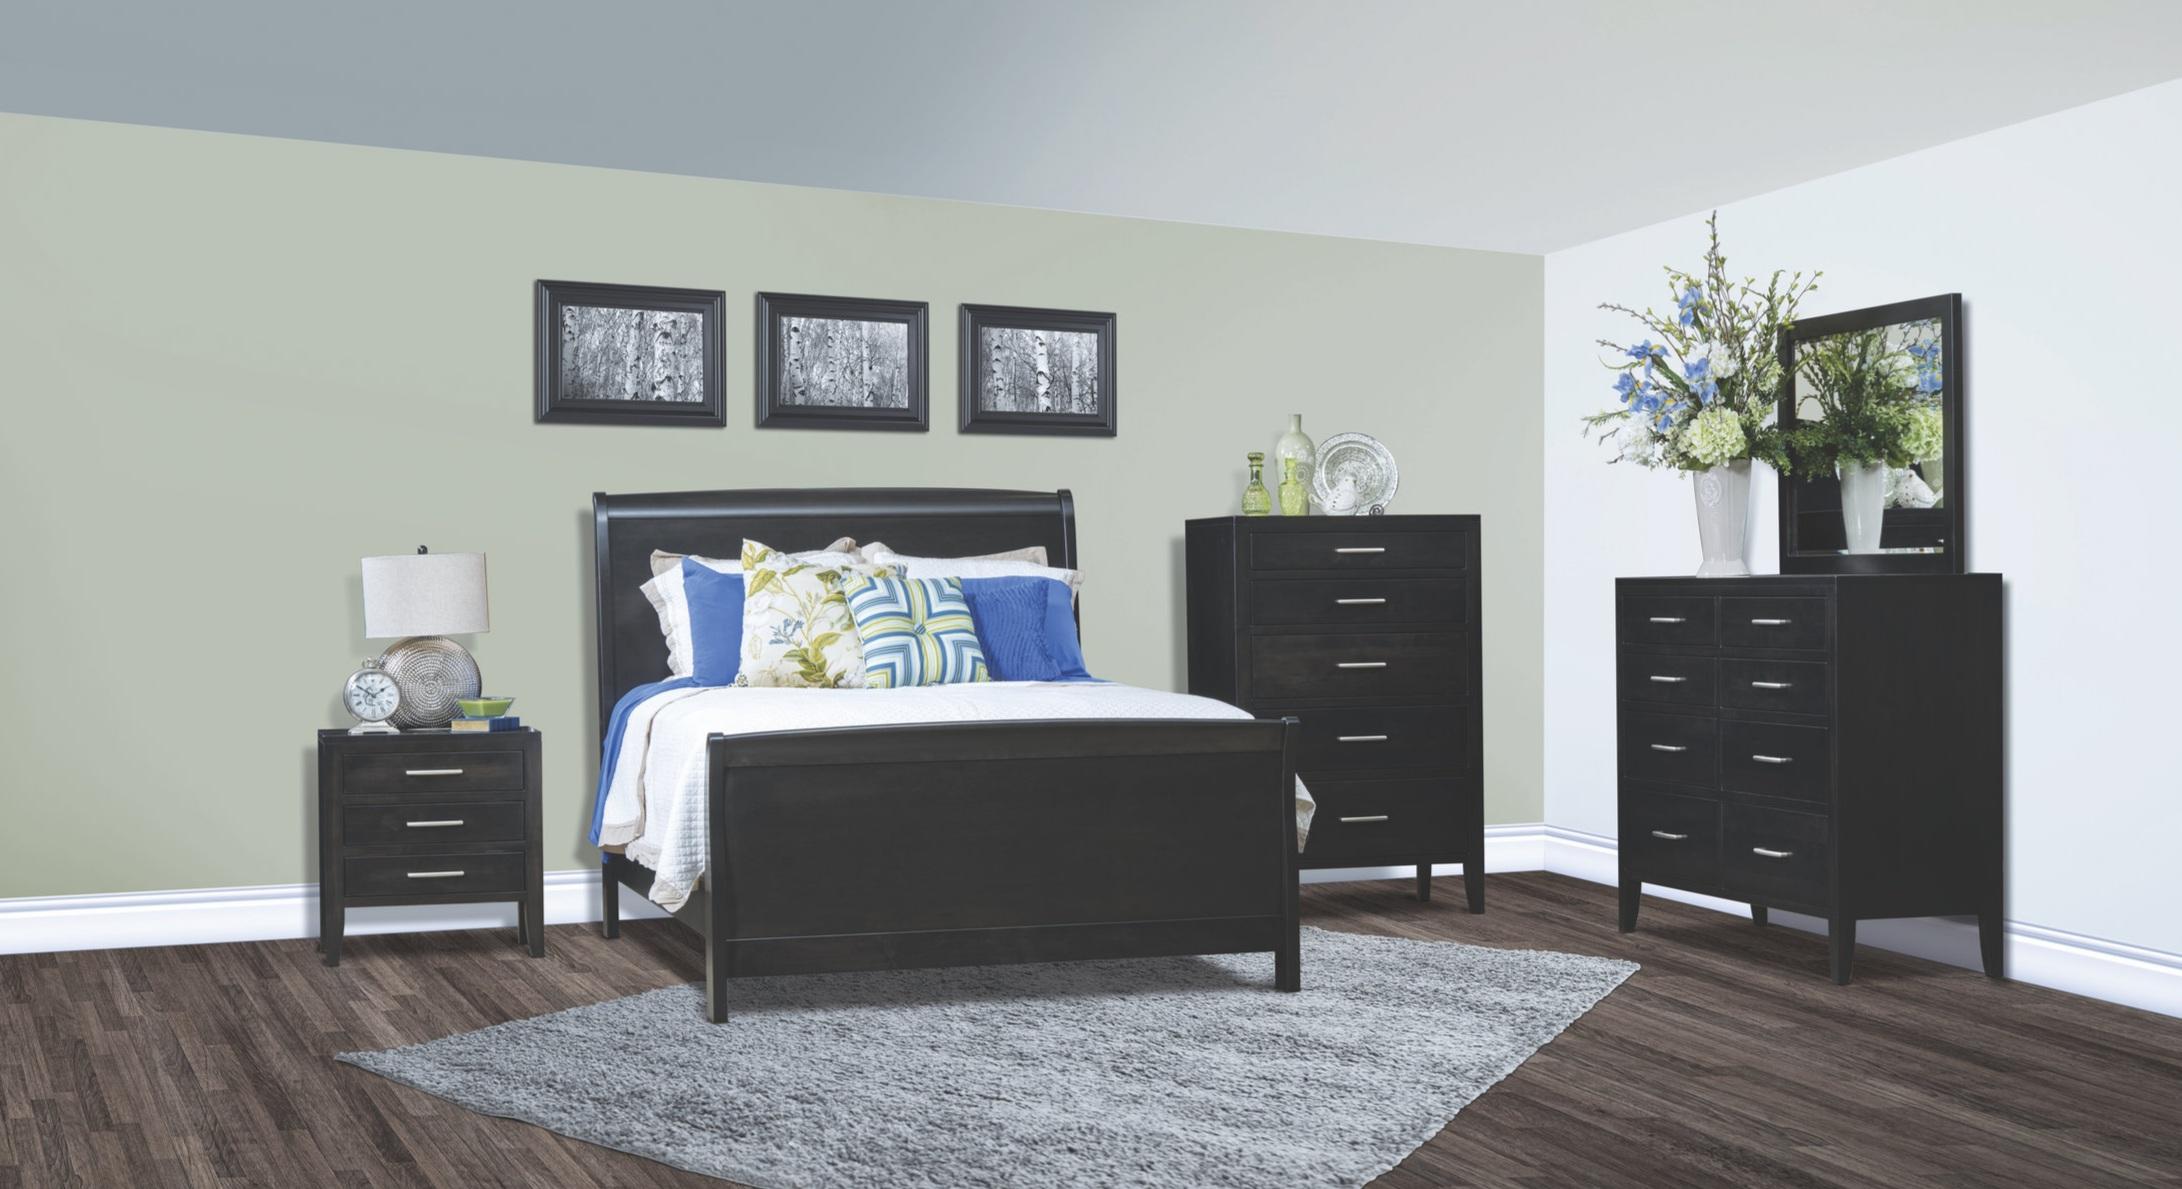 Barrington_Bedroom_Collection-Featured.jpg